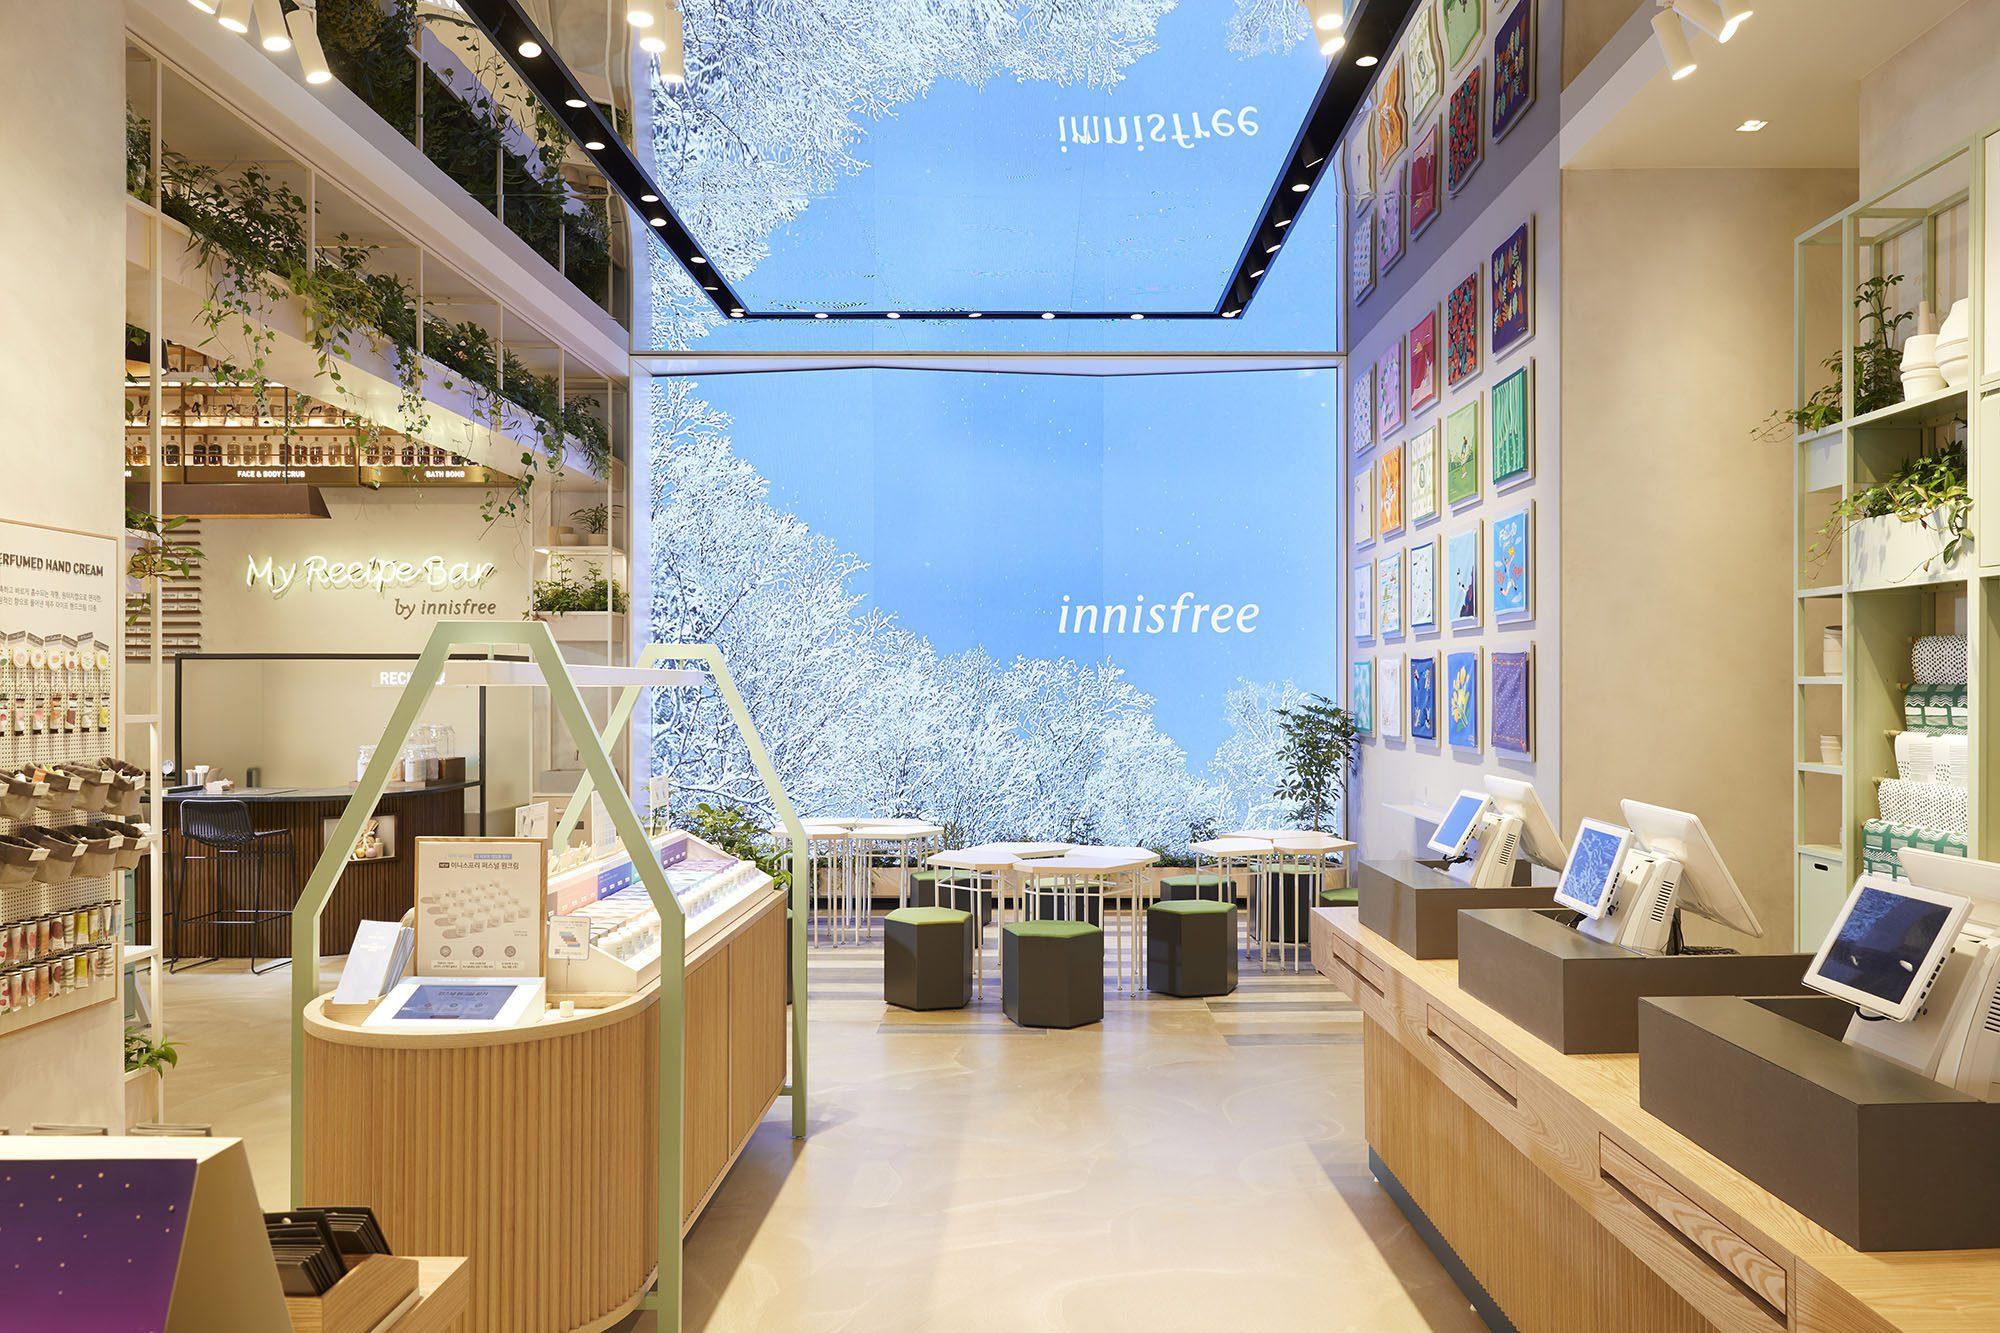 Innisfree, Seoul | 2019 Design Award Winner